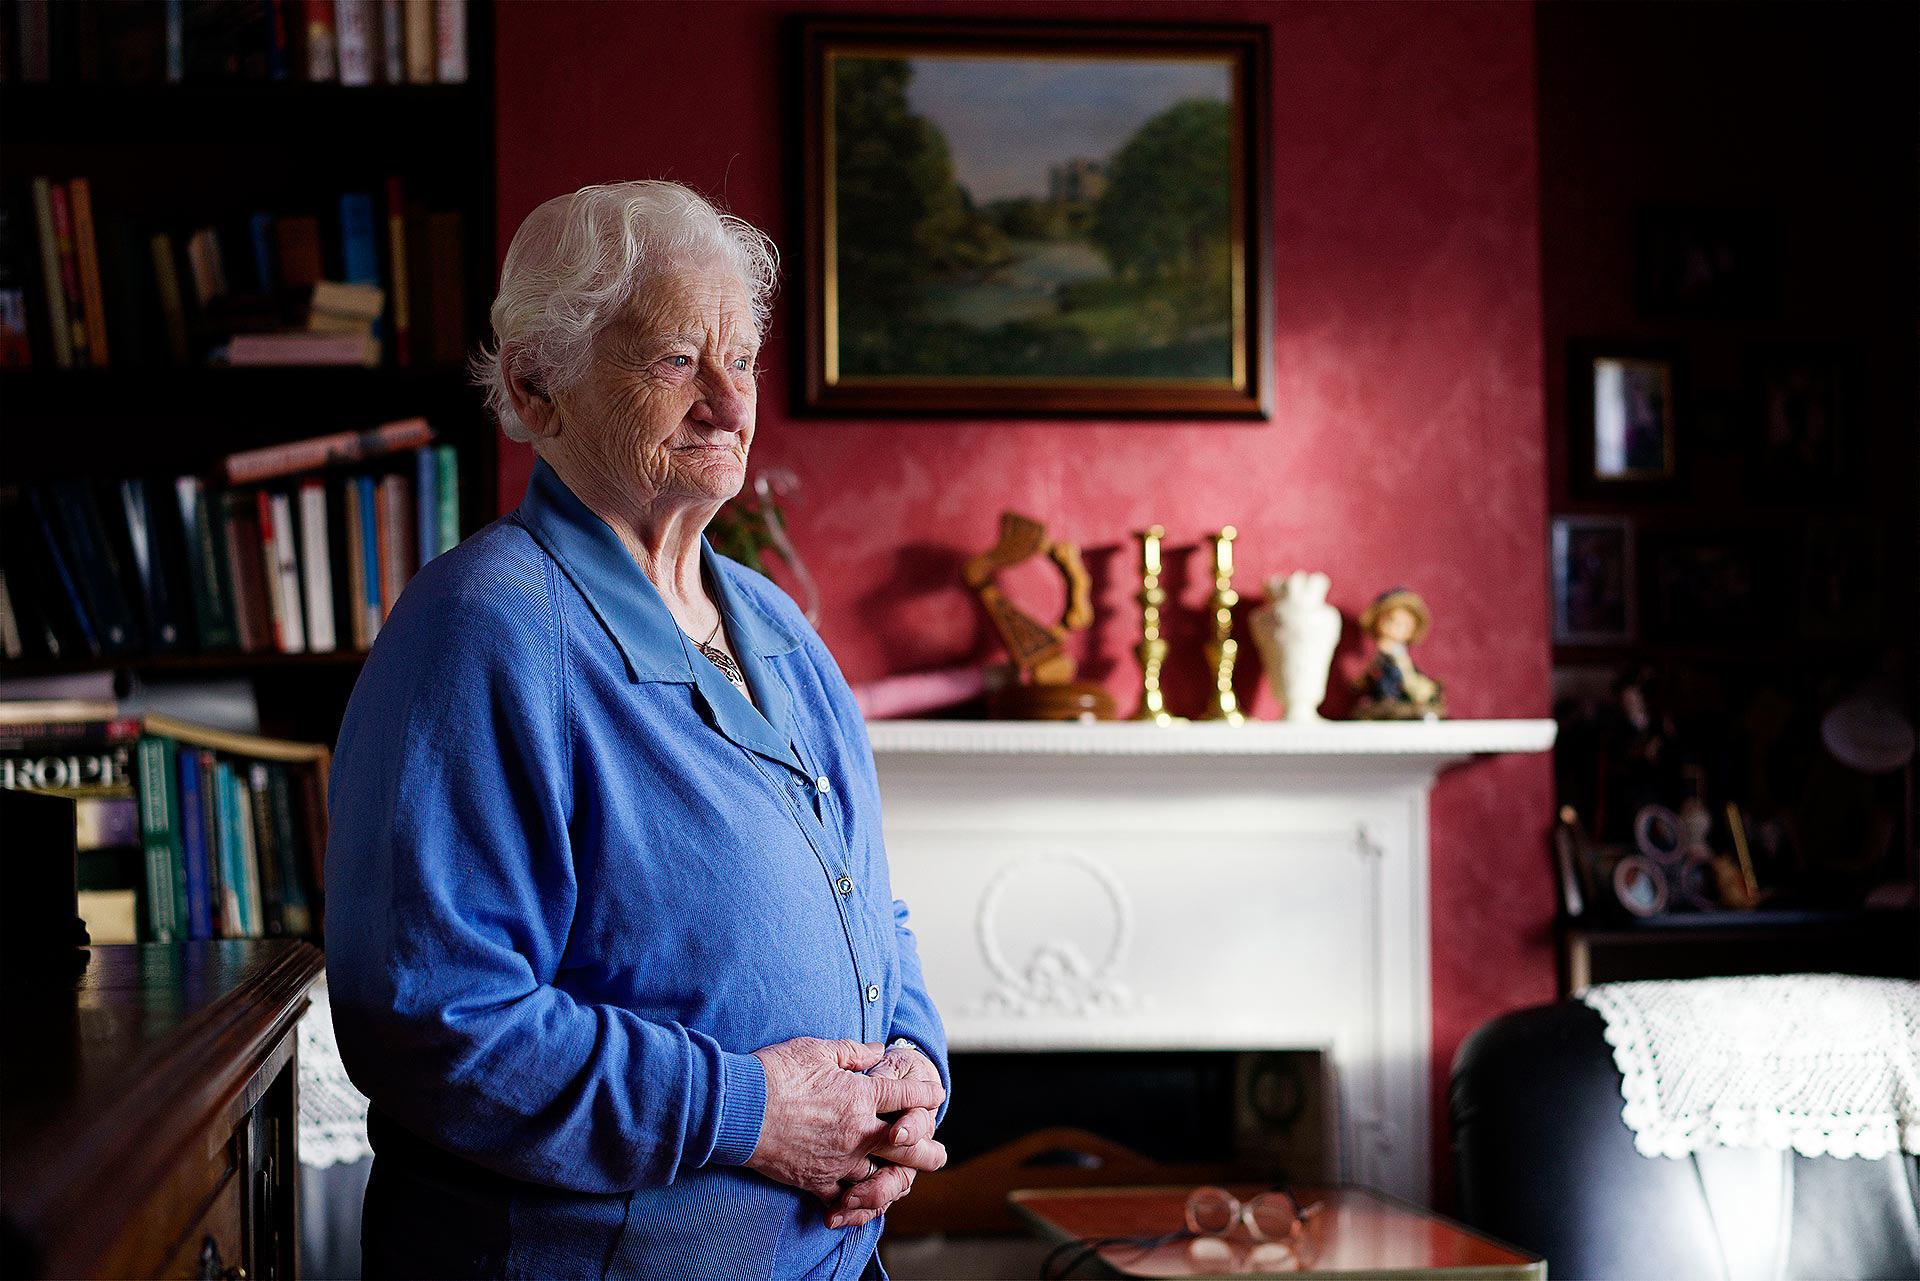 Rita McCann for The Guardian